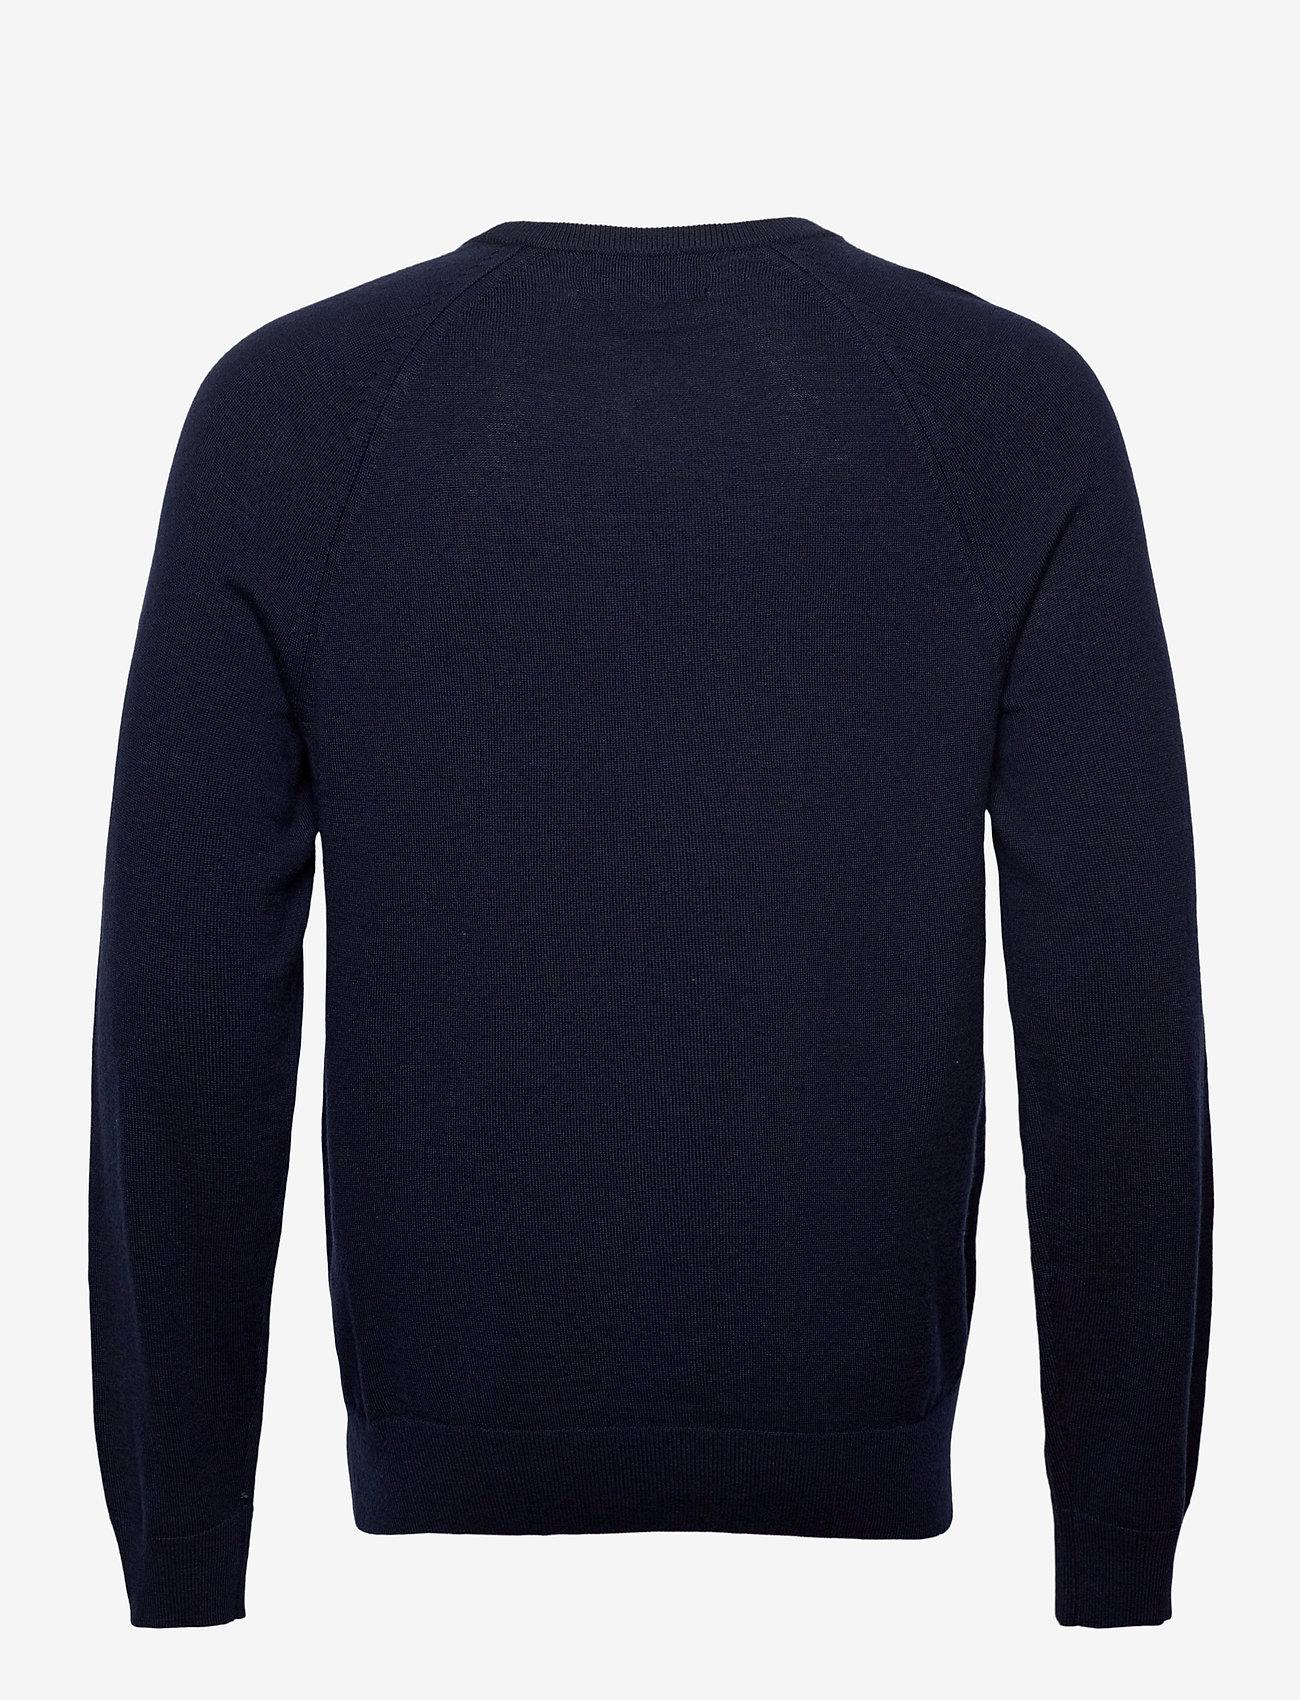 Banana Republic - Italian Merino Crew-Neck Sweater - basic knitwear - navy - 1